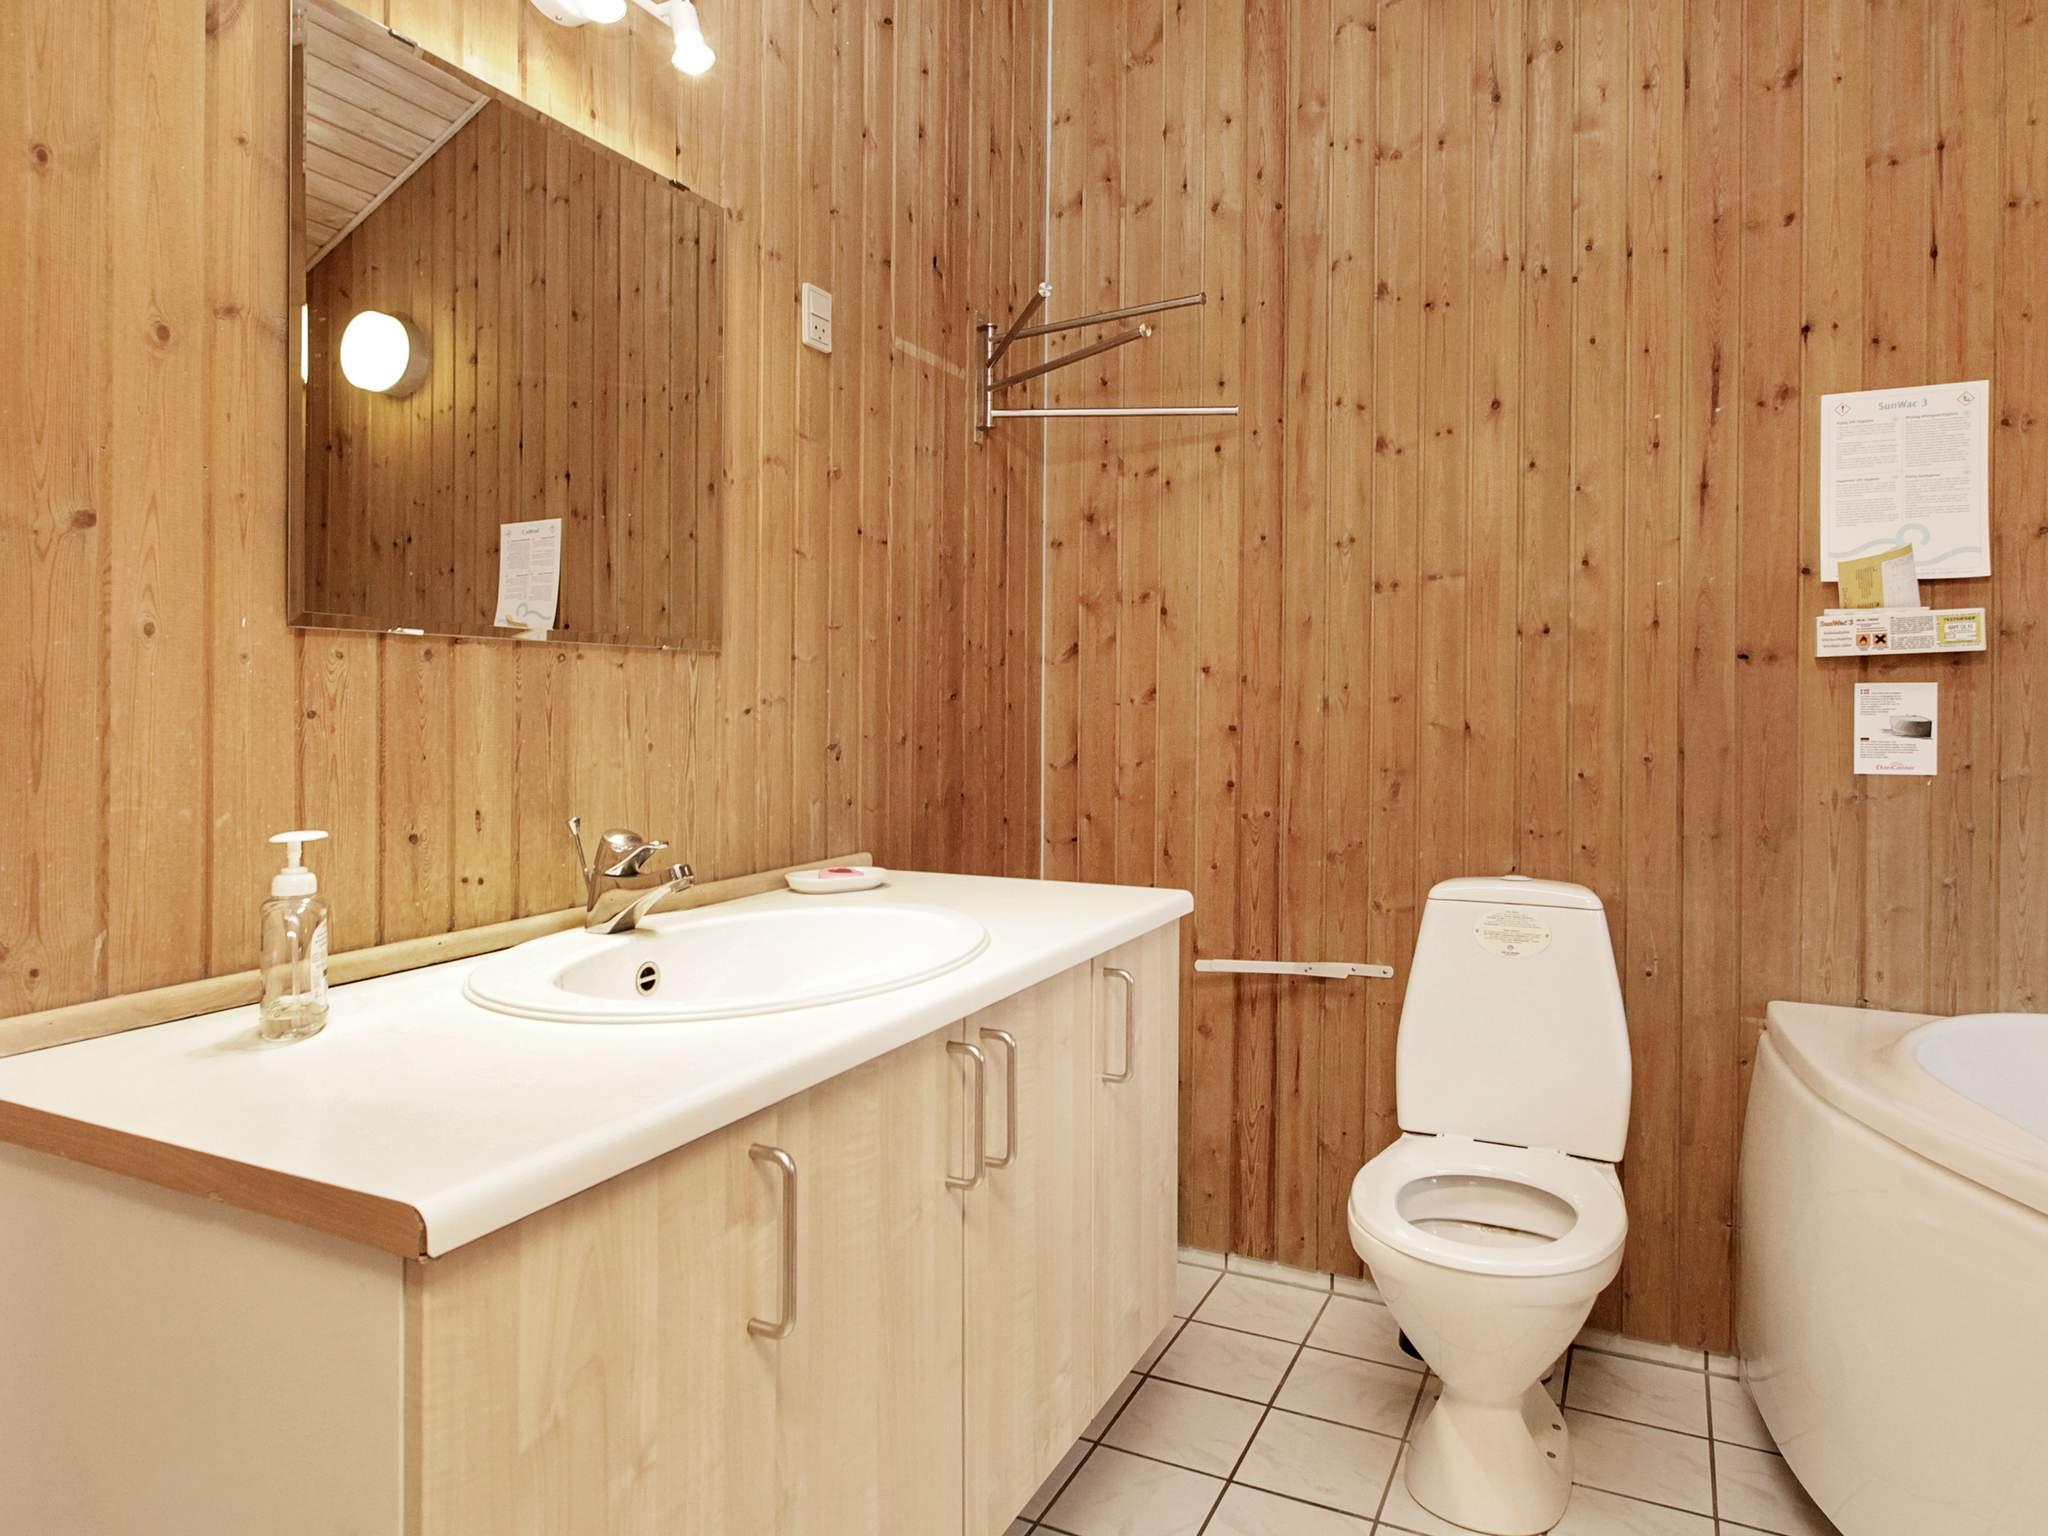 Ferienhaus Fredmosen (596960), Humble, , Langeland, Dänemark, Bild 11